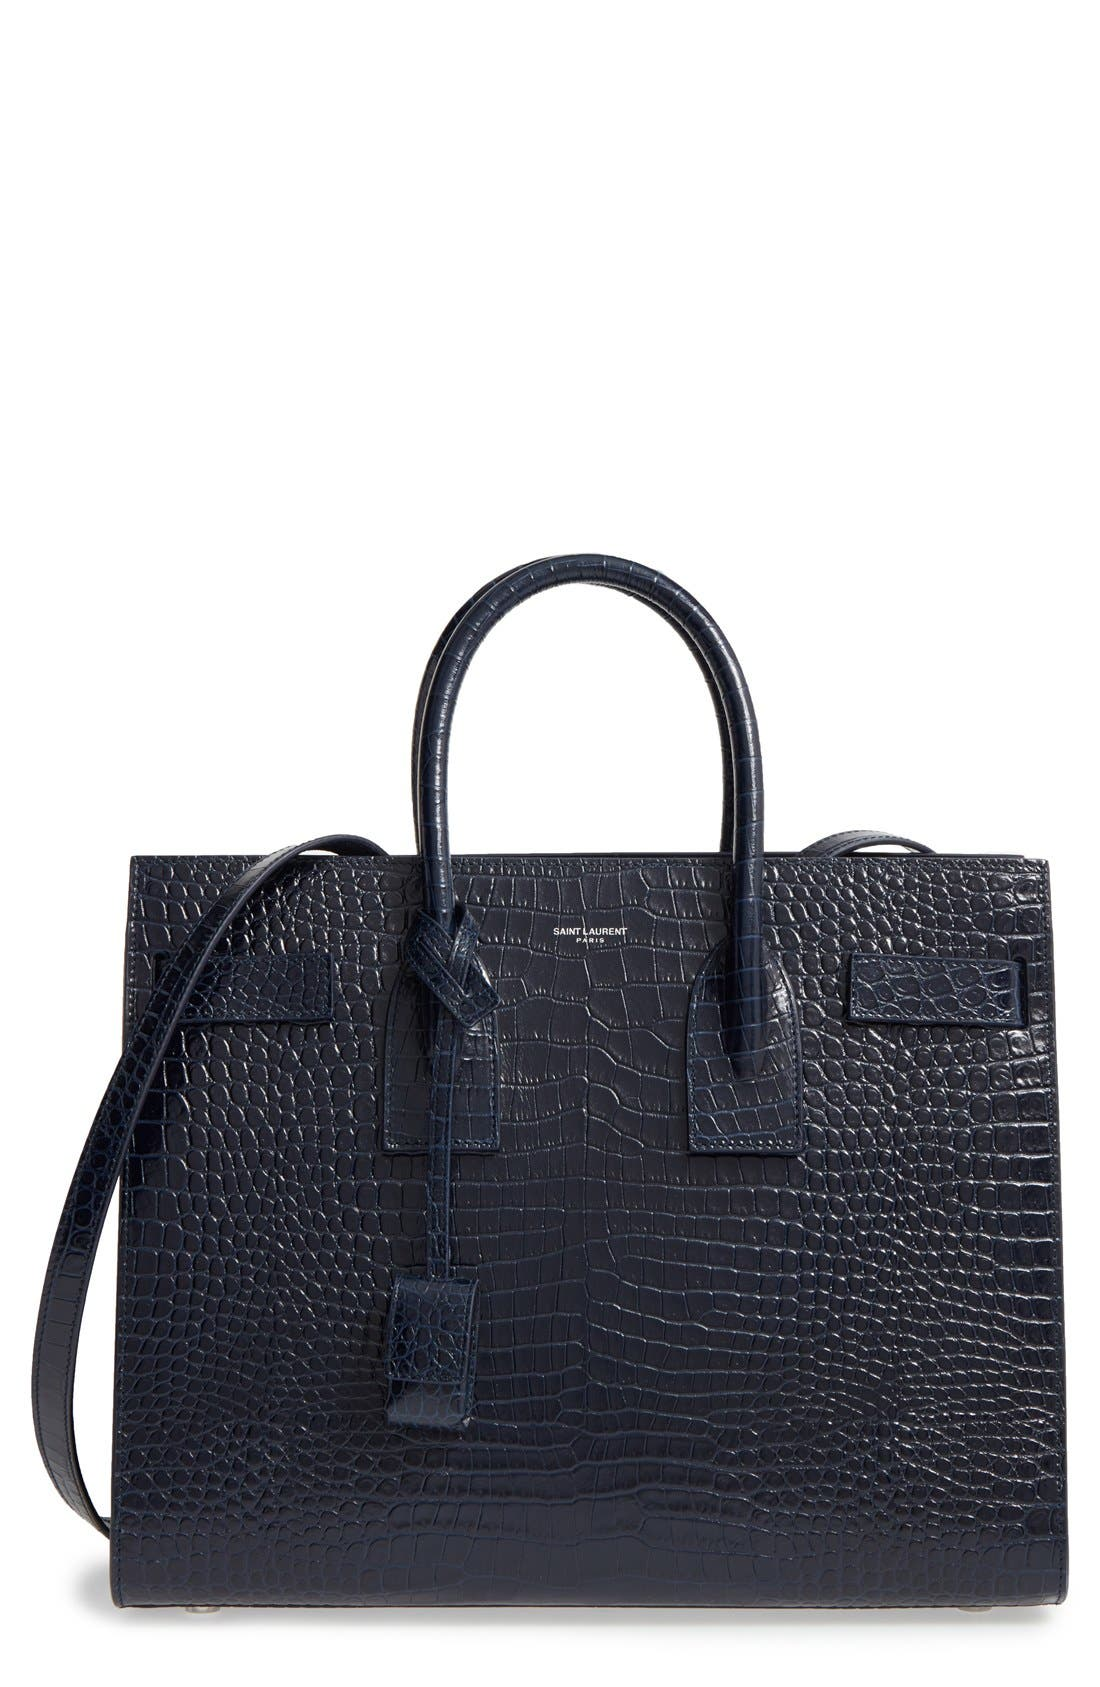 Main Image - Saint Laurent Small Sac de Jour Croc Embossed Calfskin Leather Tote